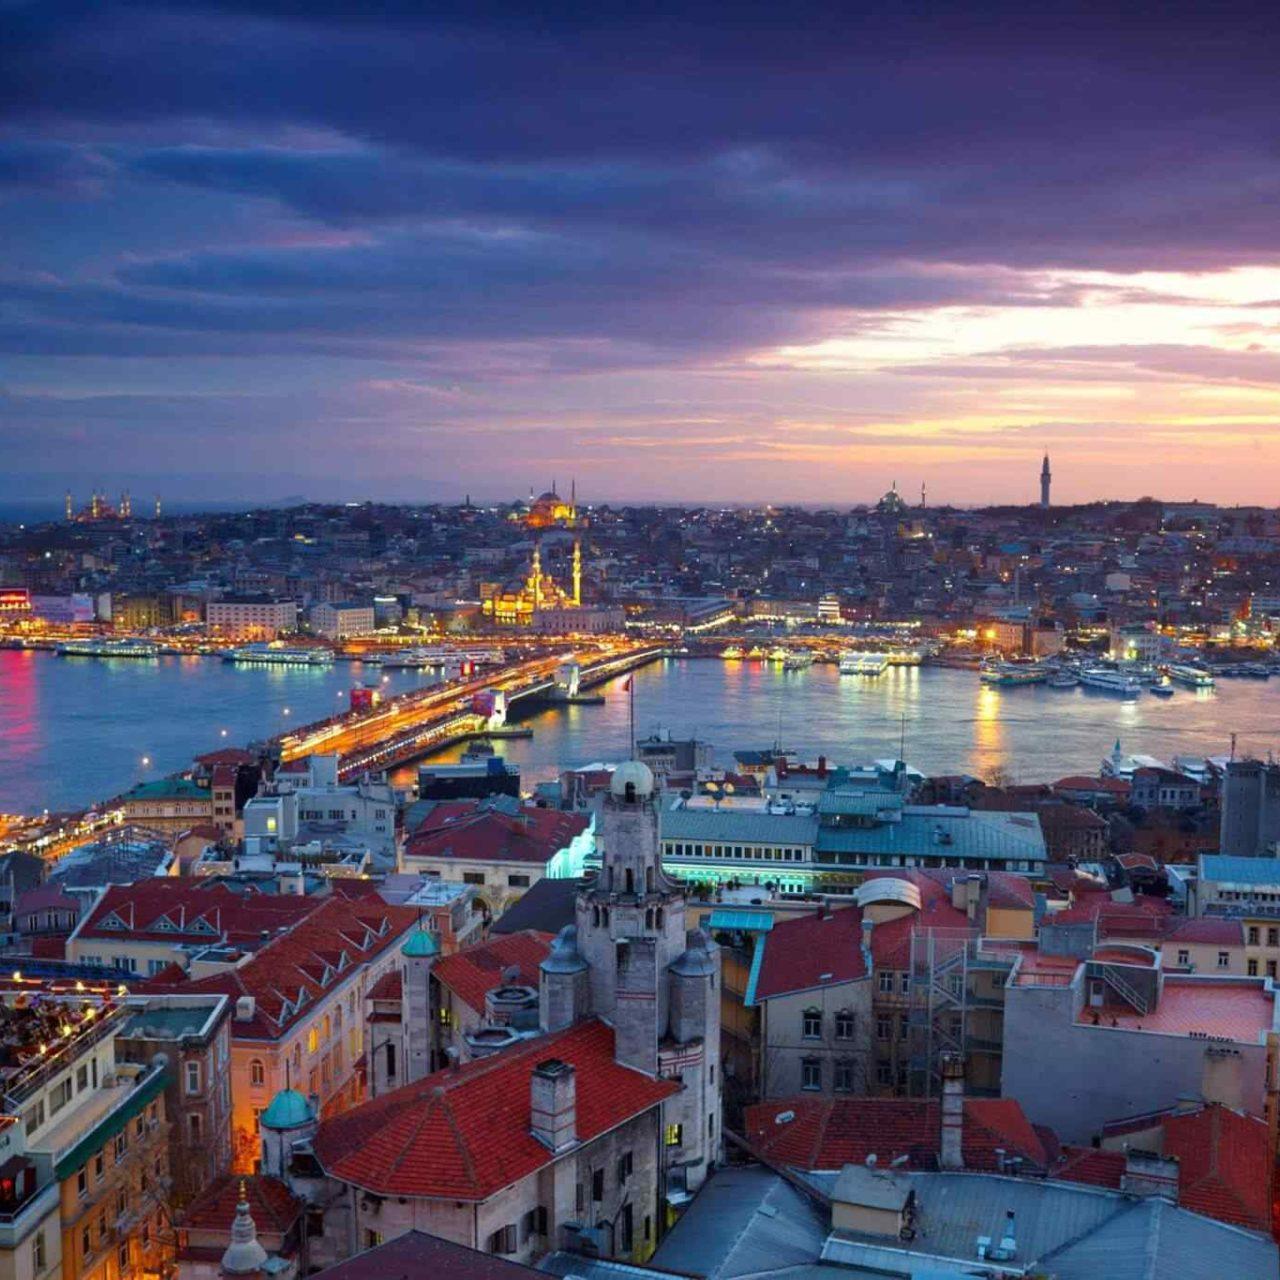 https://www.banitours.com/wp-content/uploads/2018/09/destination-istanbul-01-1280x1280.jpg